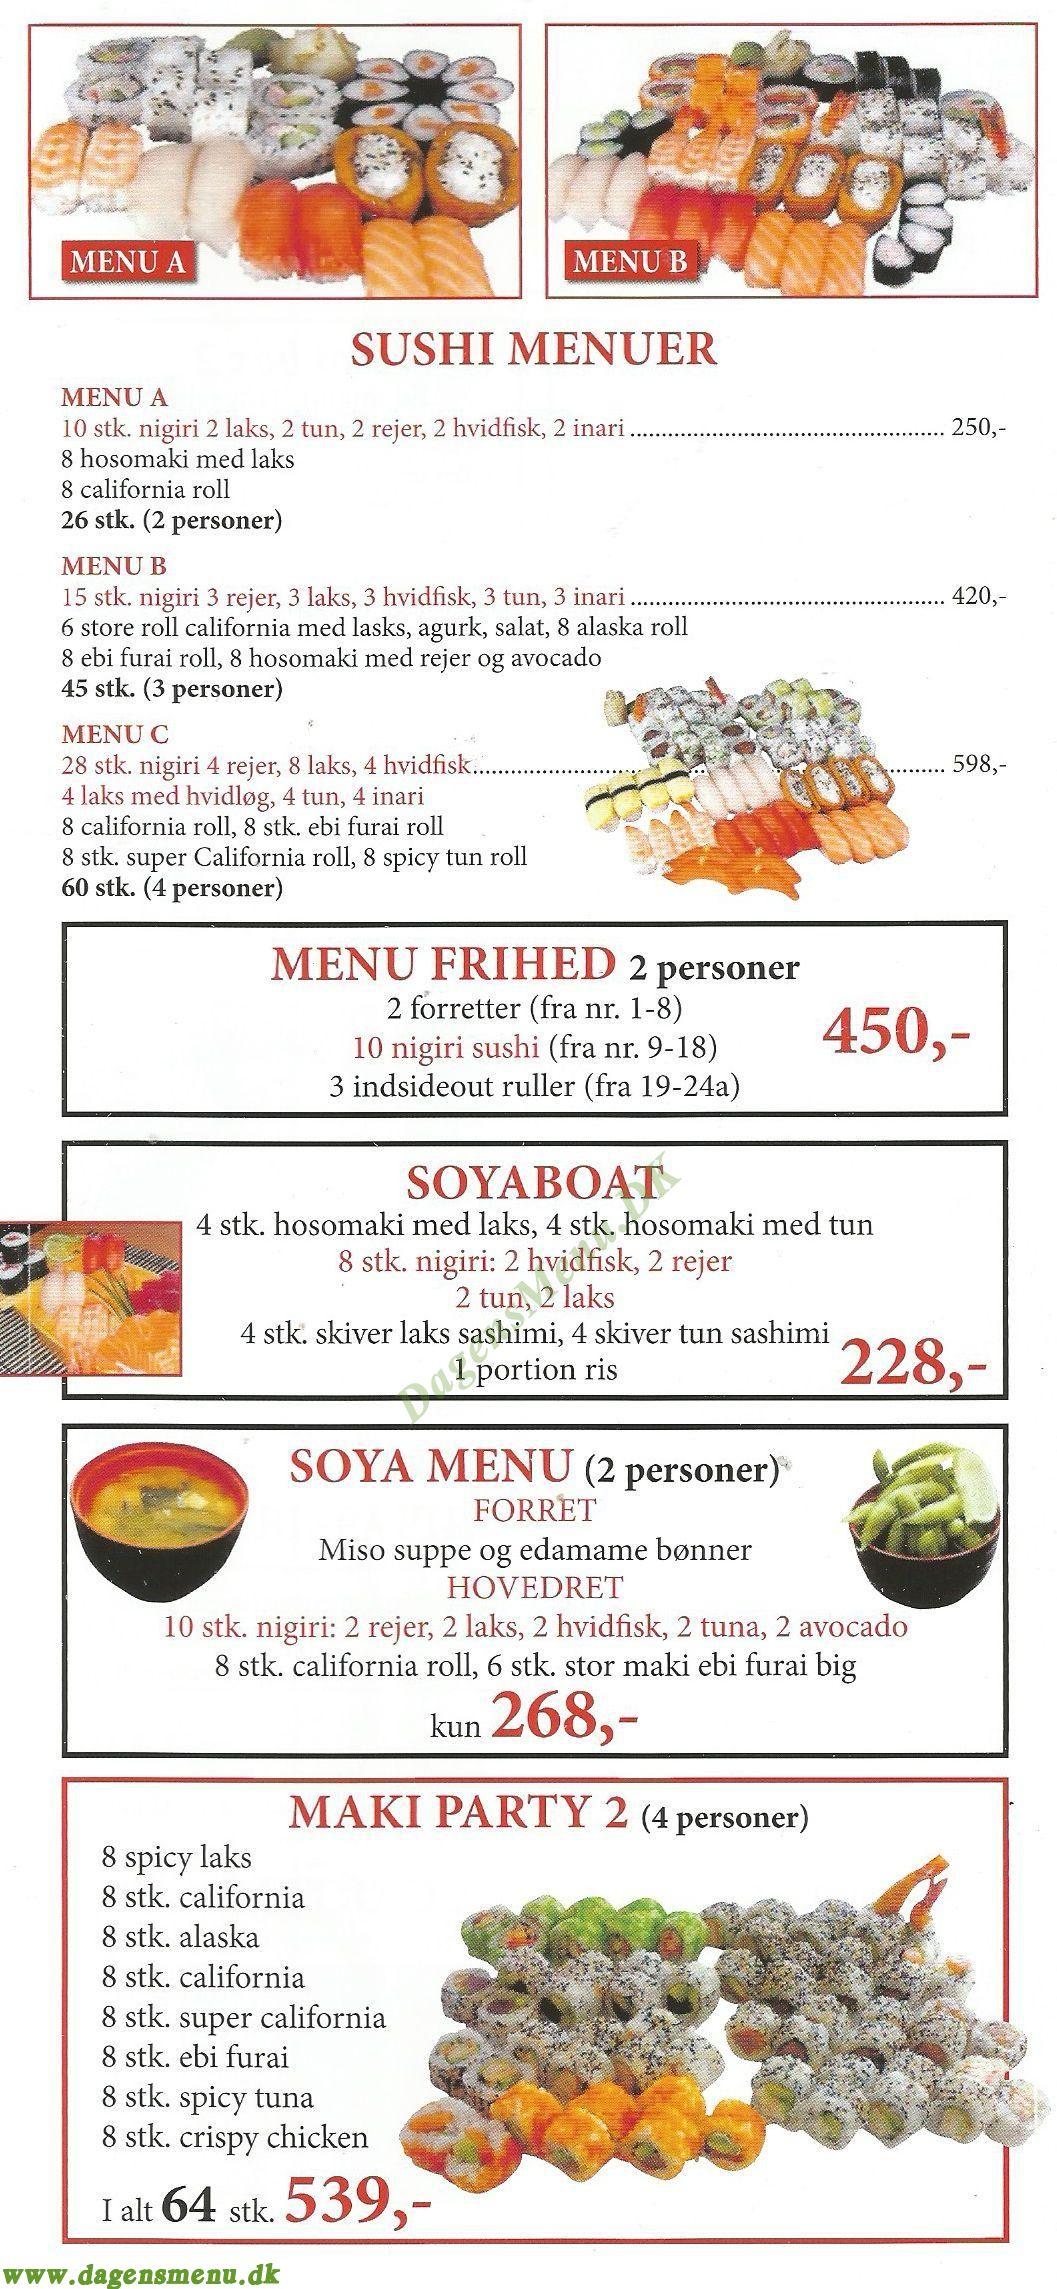 Soya Sushi - Menukort